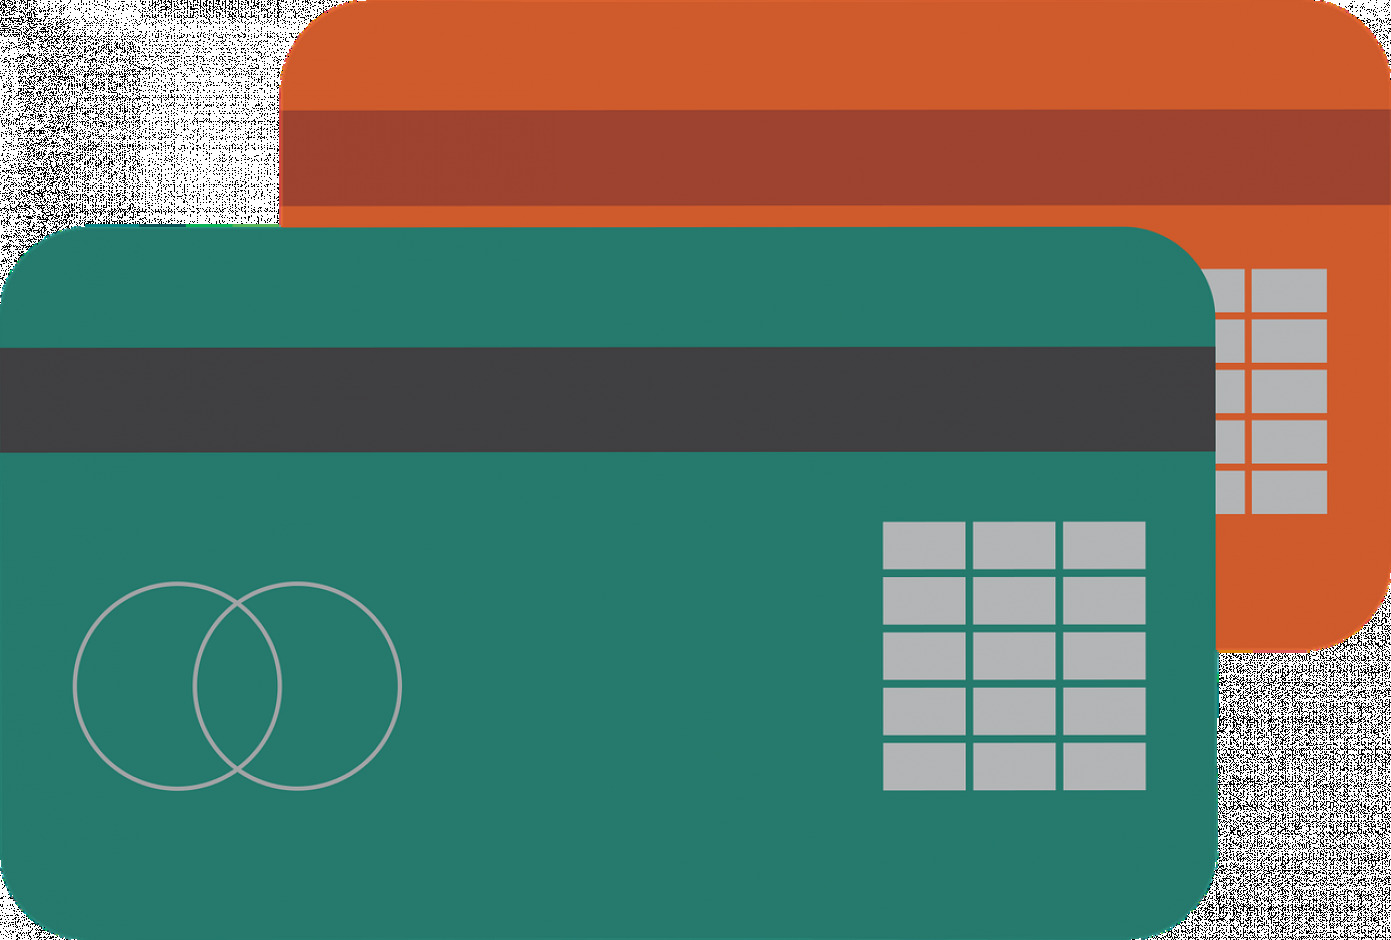 card clipart credit card